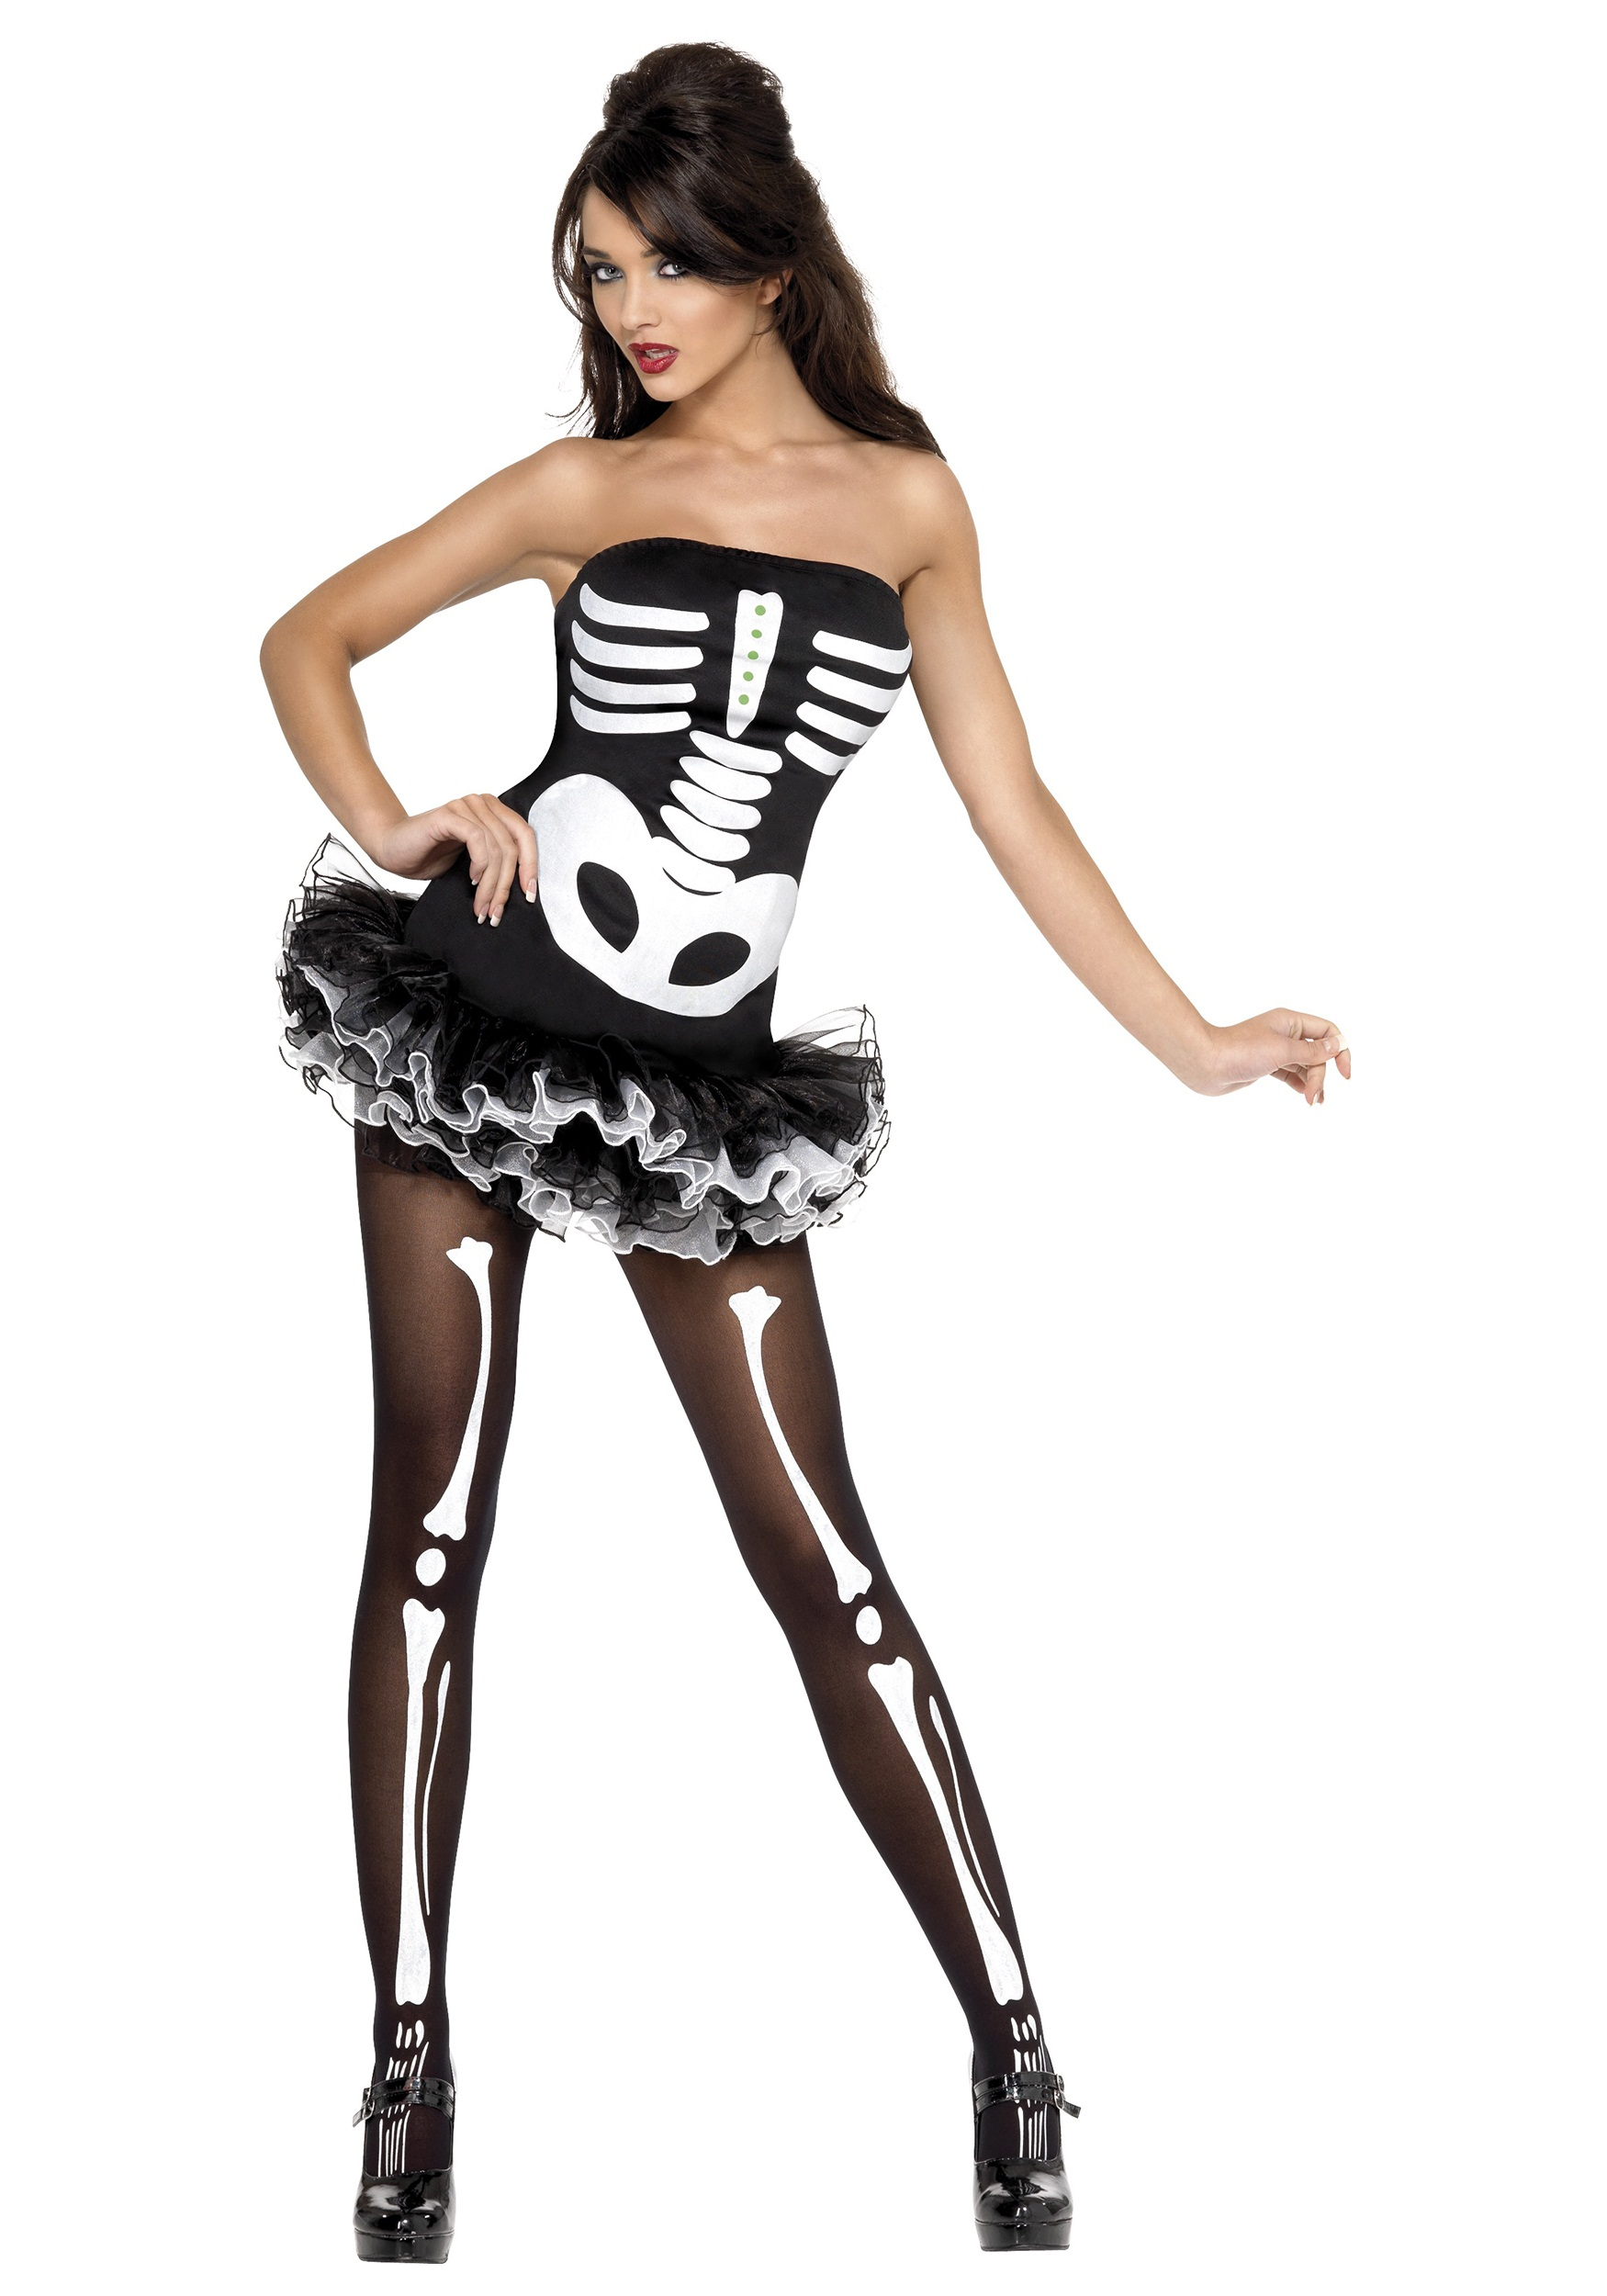 Ladies Skeleton Dress X Ray Skeleton Tube Dress Halloween Fancy Dress Costume